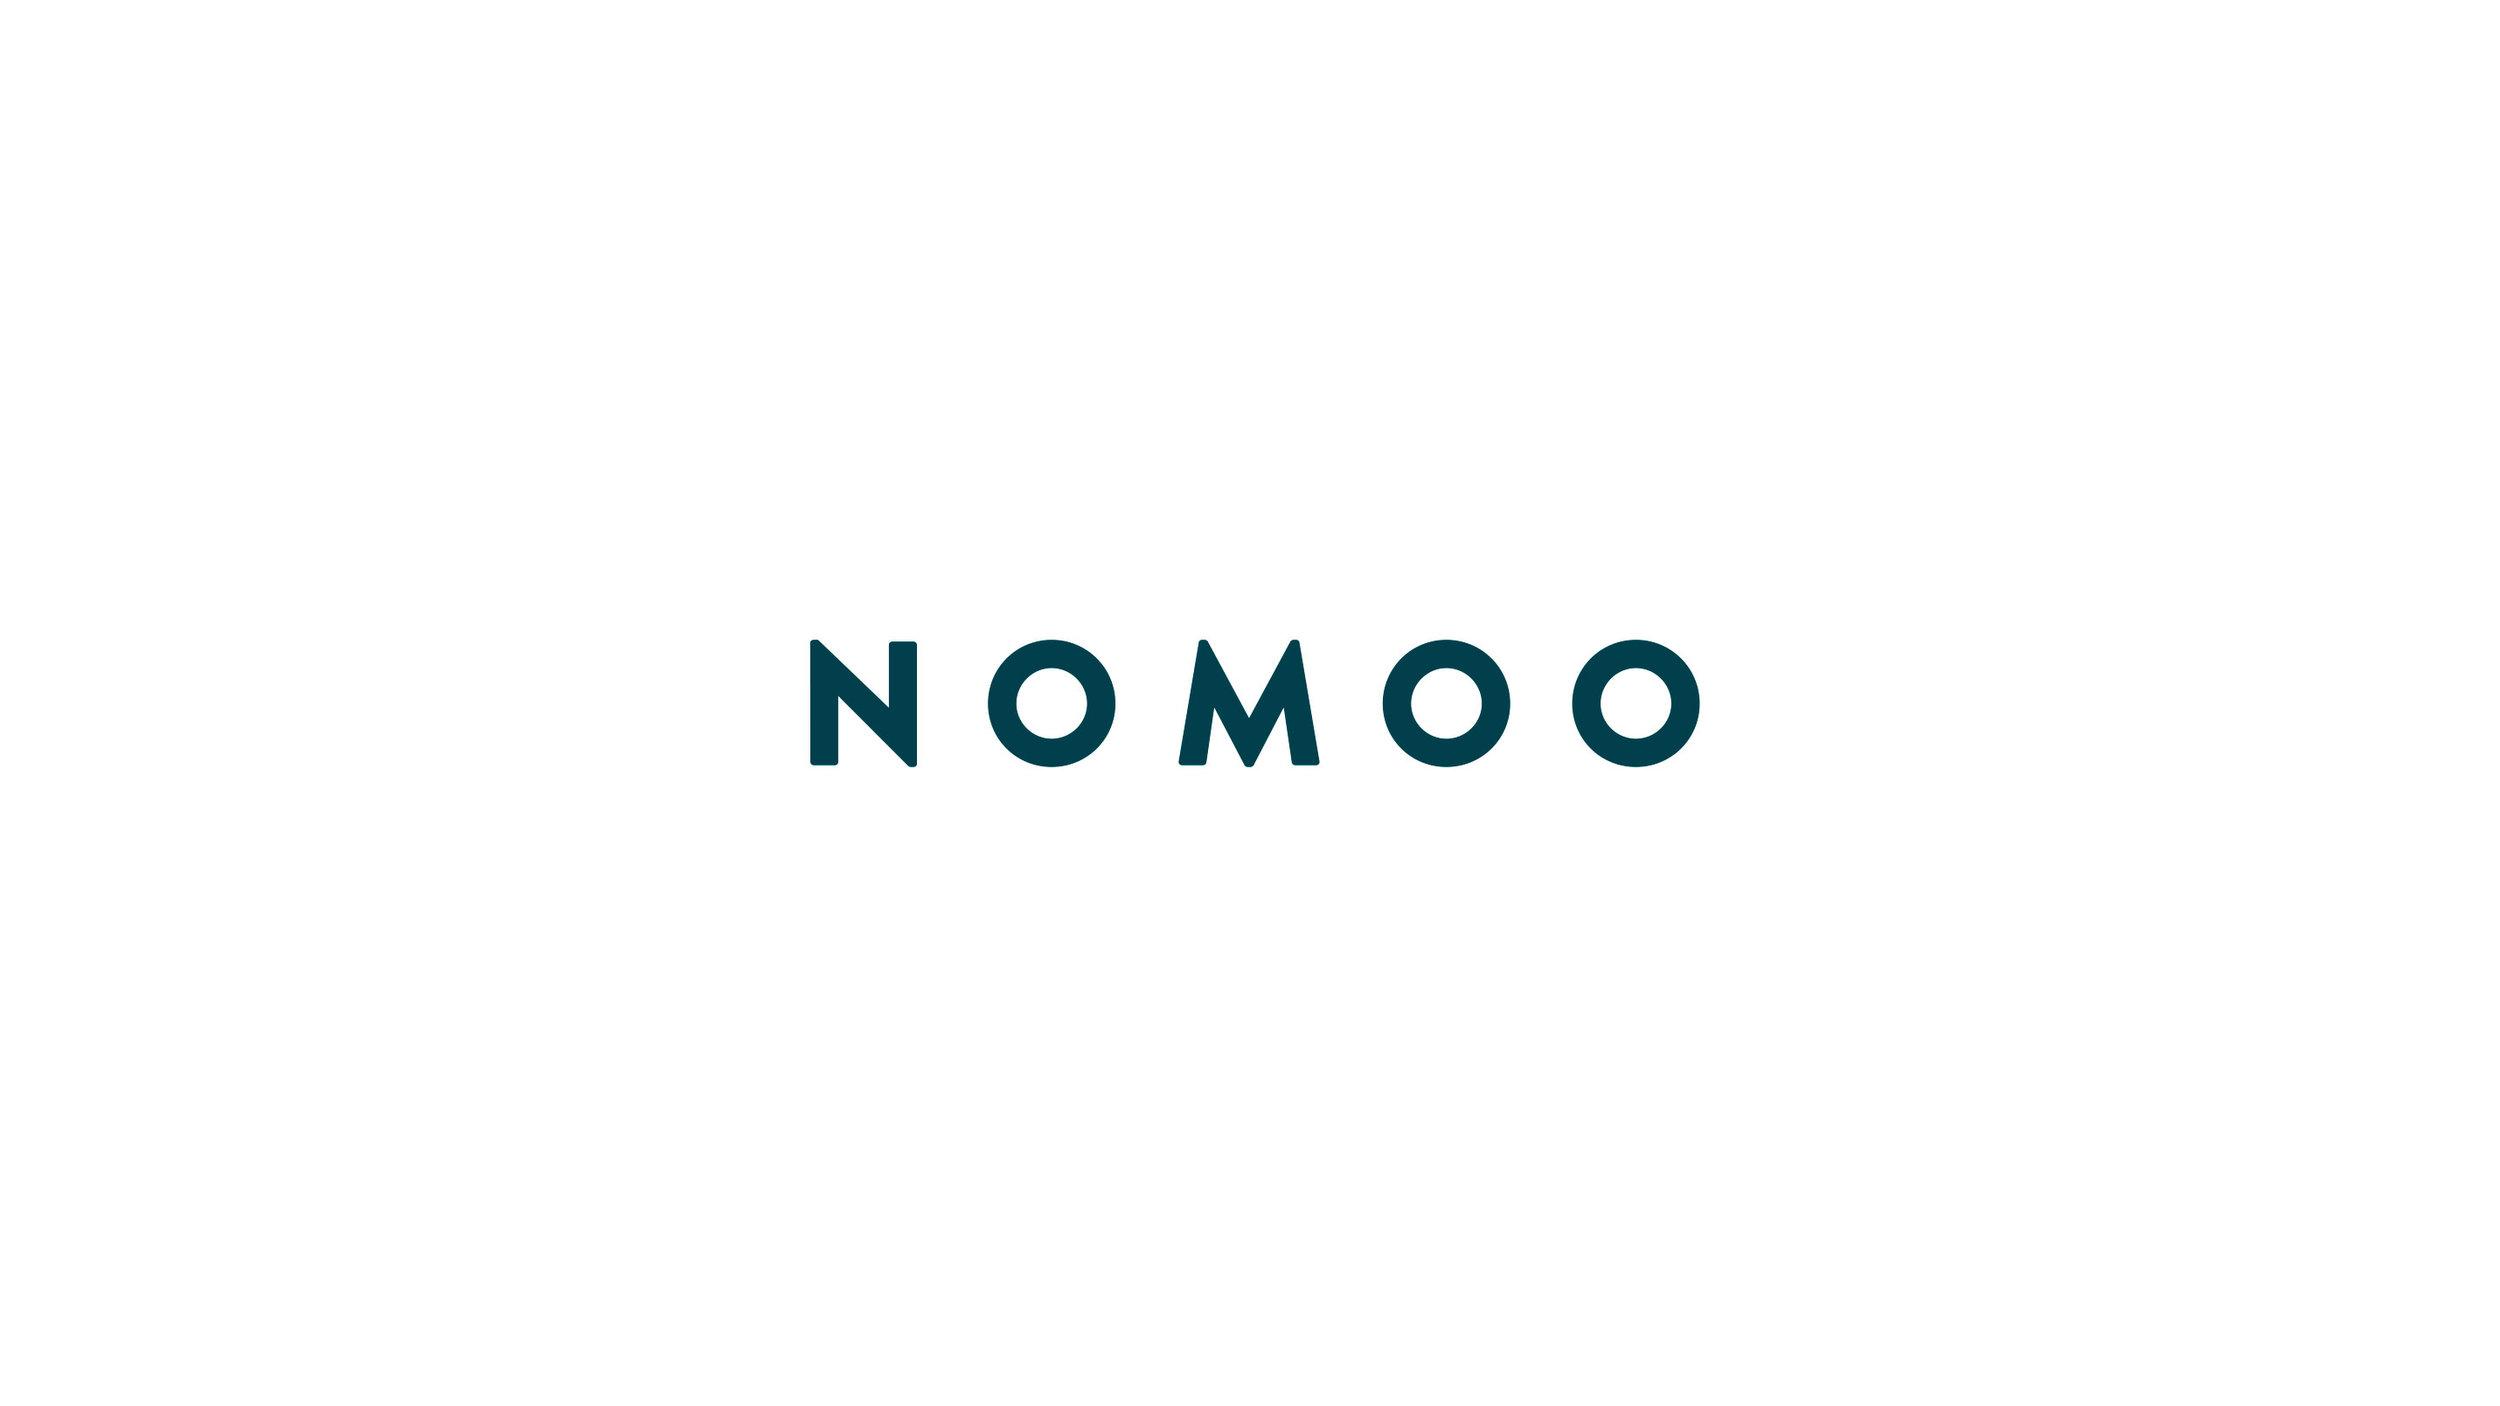 NOMOO-logo-dright-bg.jpg